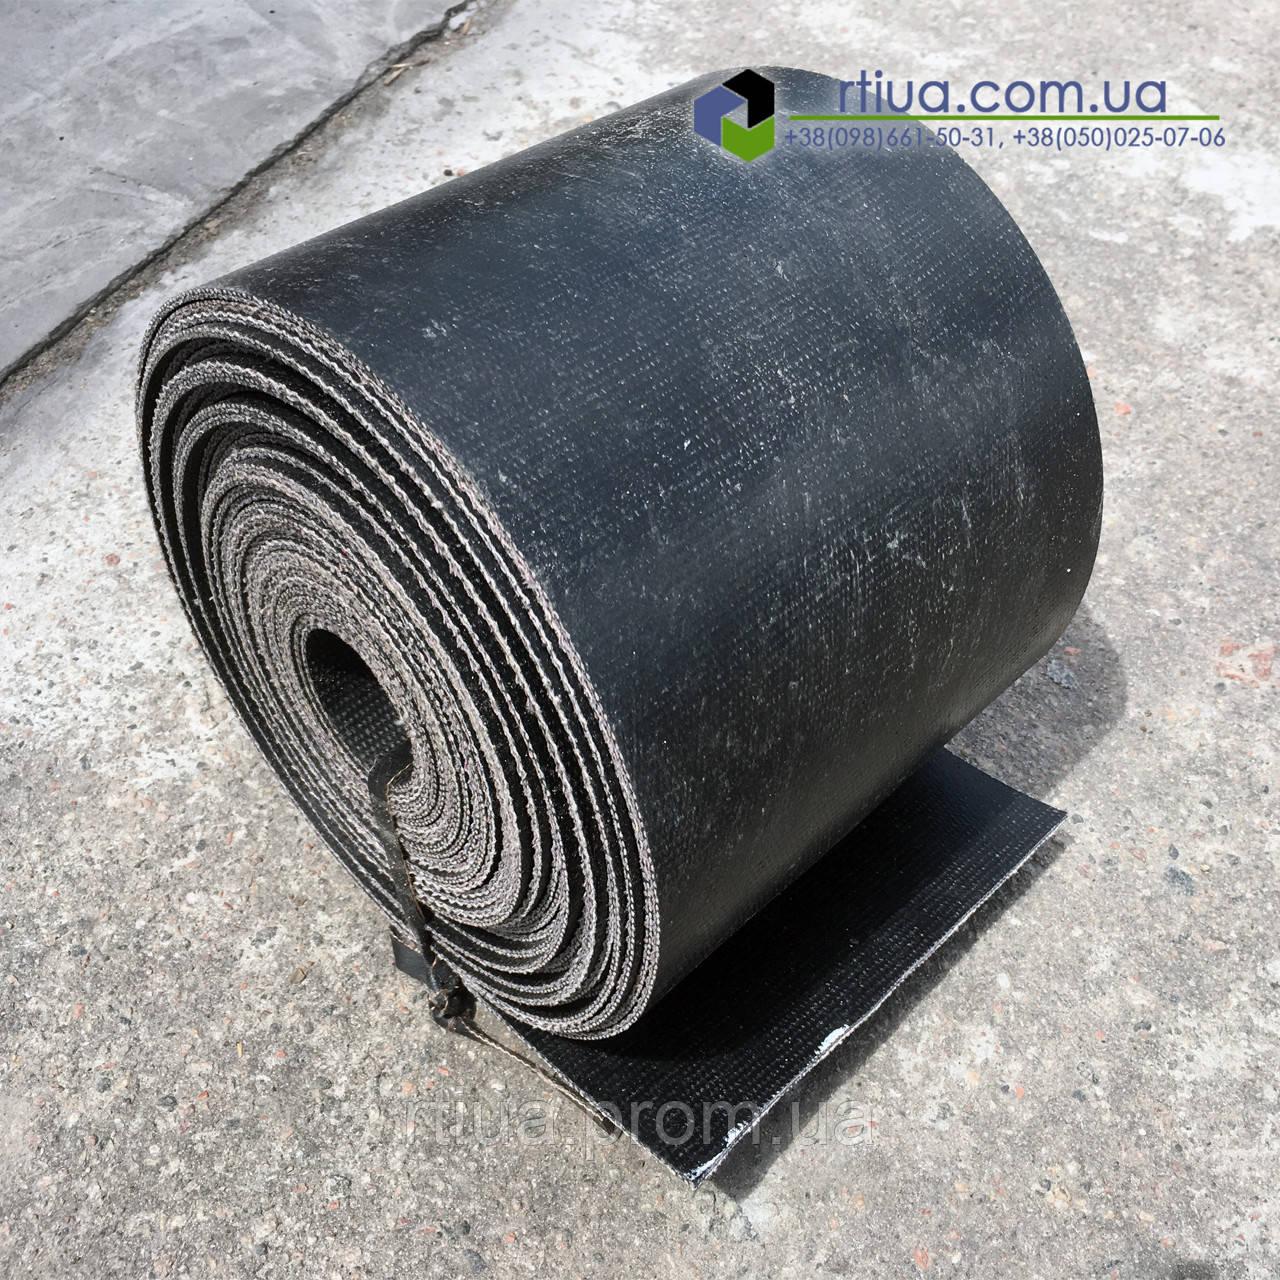 Транспортерная лента ТК-200, 500х3 - 5/2 (10 мм)